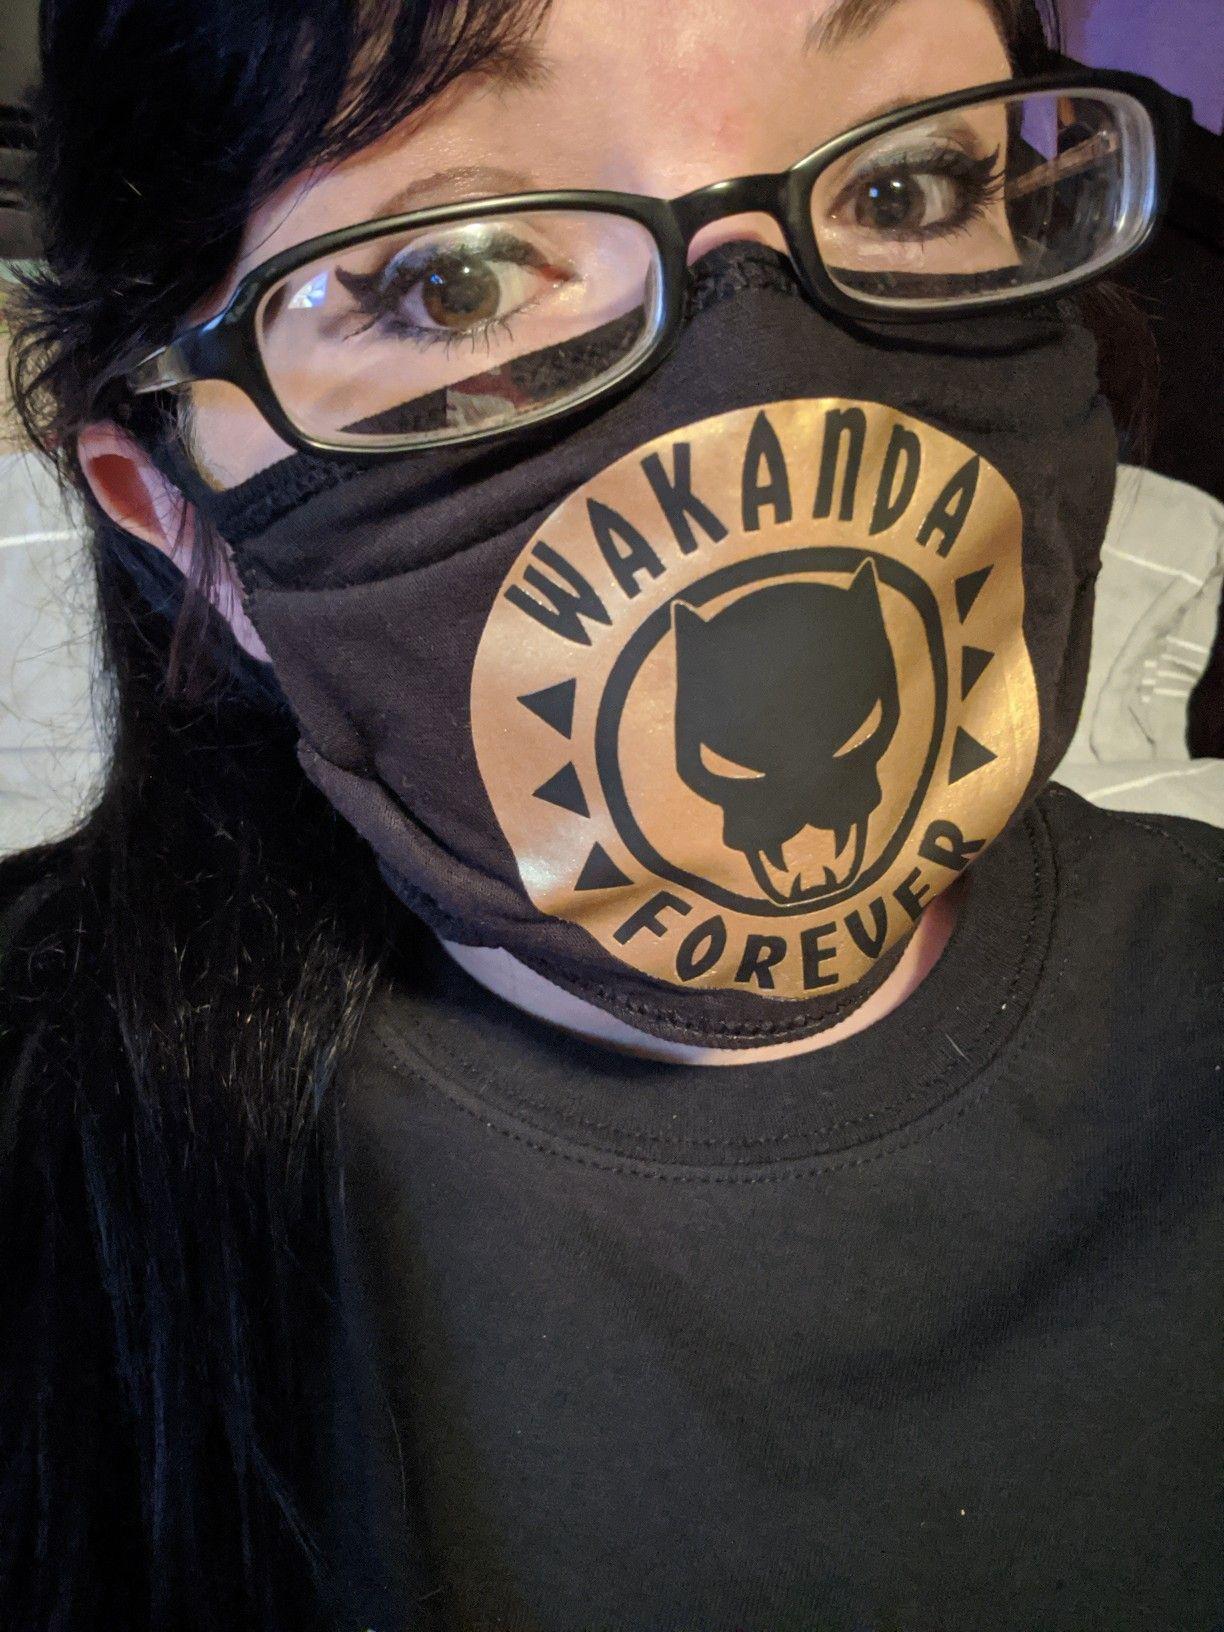 Black Panther Wakanda Forever Halloween Superhero Masks for kids or adult! #halloween #marvel #marvelcomics #superhero #blackpanther #superheroes #marvelstudios #marveluniverse #marvellegends #wakandaforever #wakanda #halloween🎃 #marvelcosplay #superheros #hashtagr #halloweentime #chadwickboseman #halloweencostumes #halloweeniscoming #marvelart #marvelmovies #marvelfan #marvelfanart #blackpanthermovie #marvelfans #superherotheme #blackpantherfanart